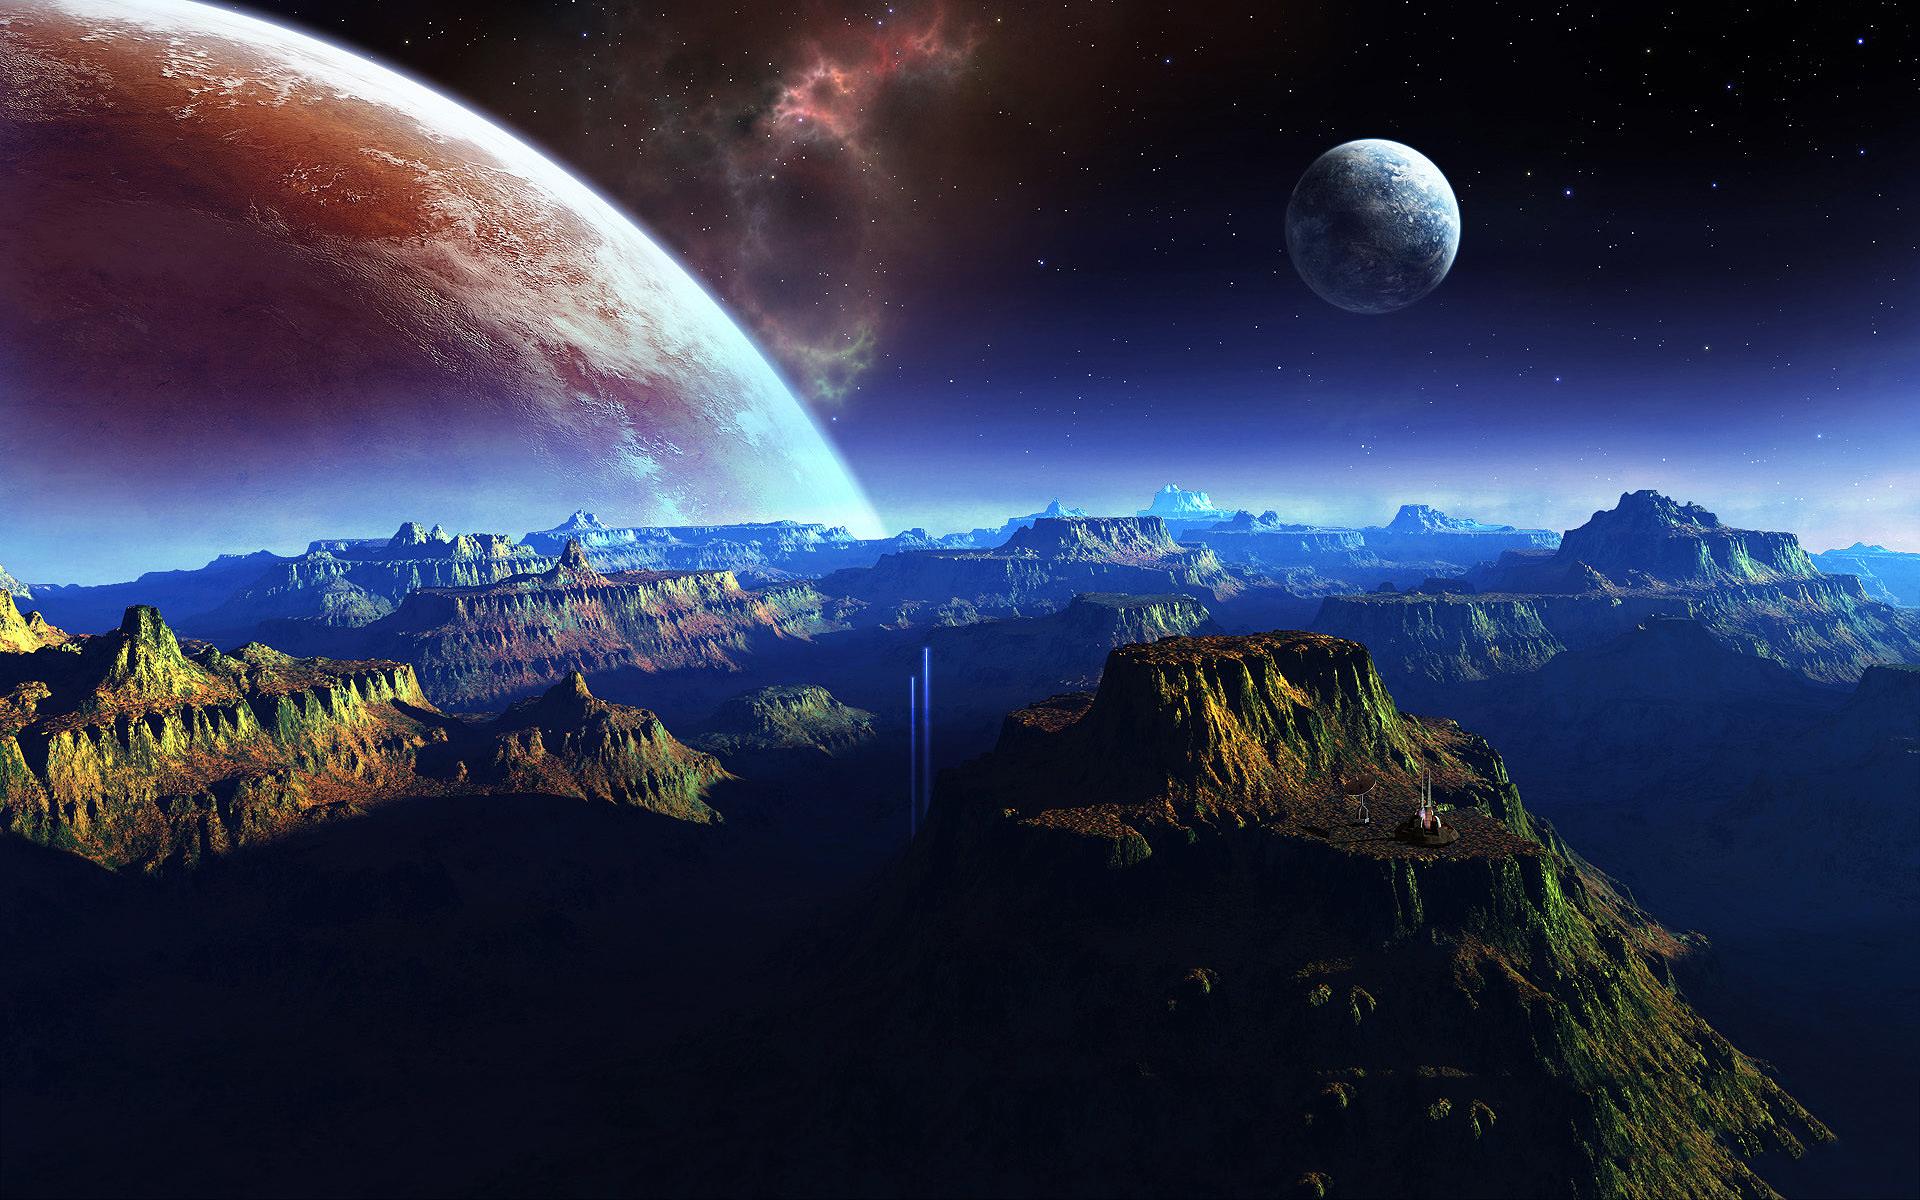 Fantasy planet space art